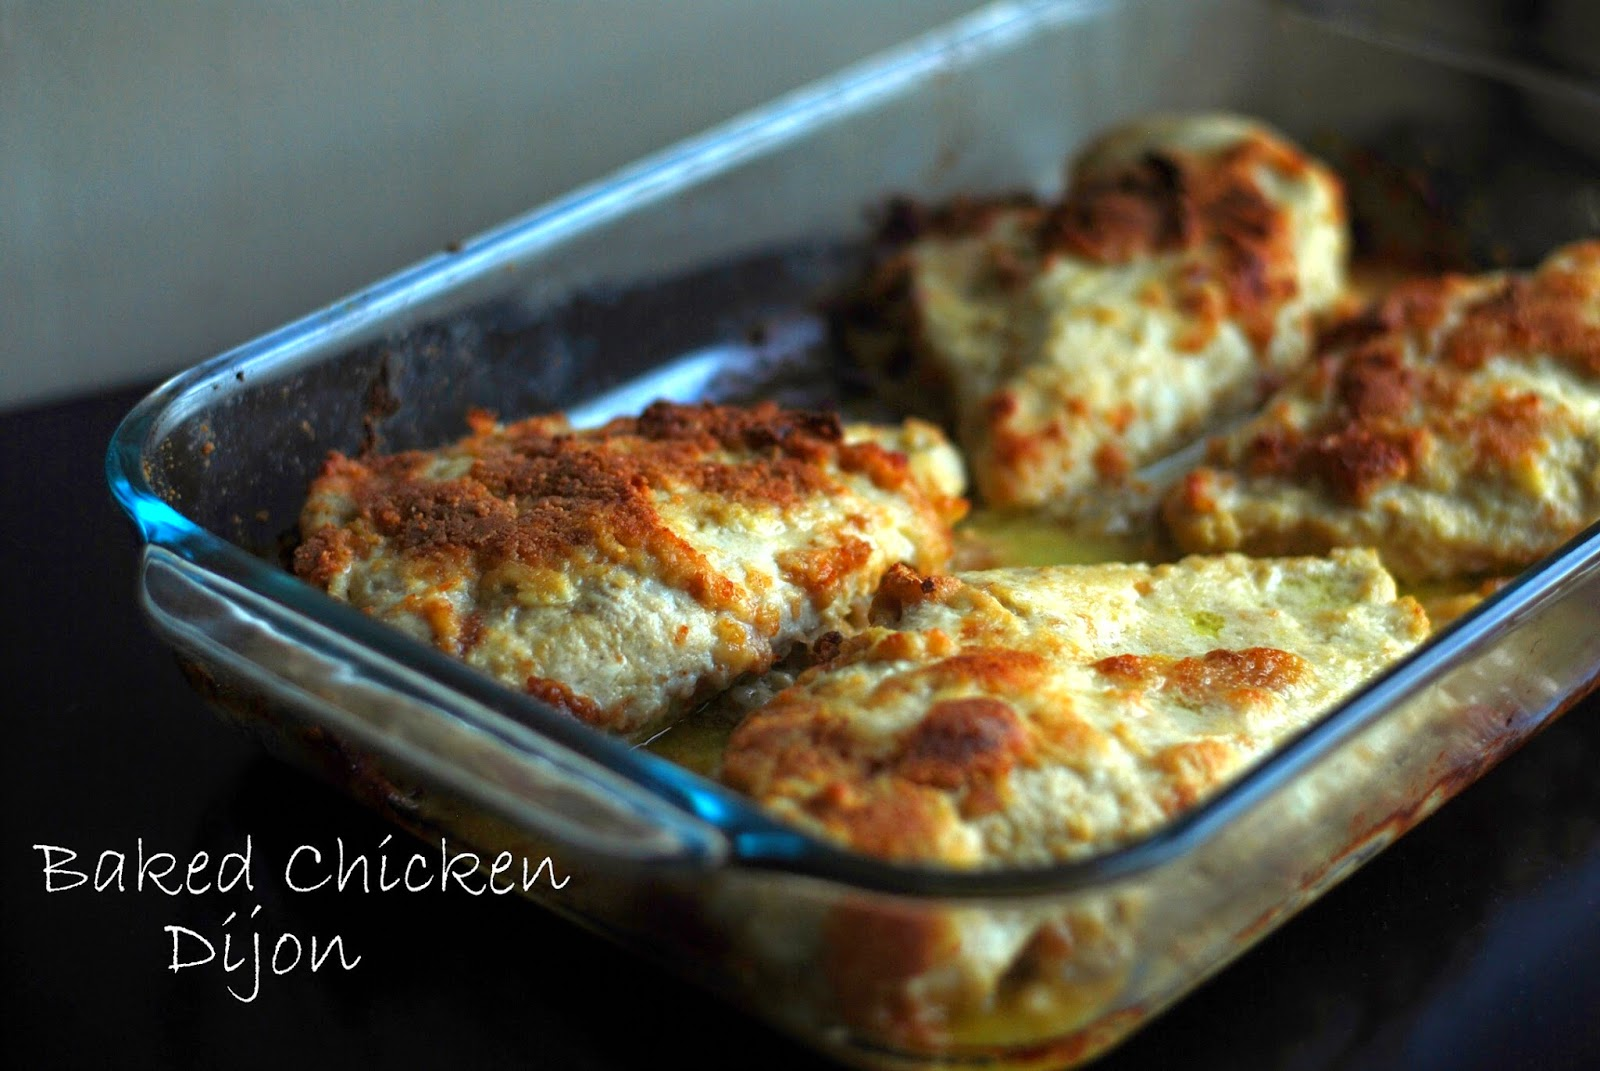 Baked Chicken Dijon | Aunt Bee's Recipes